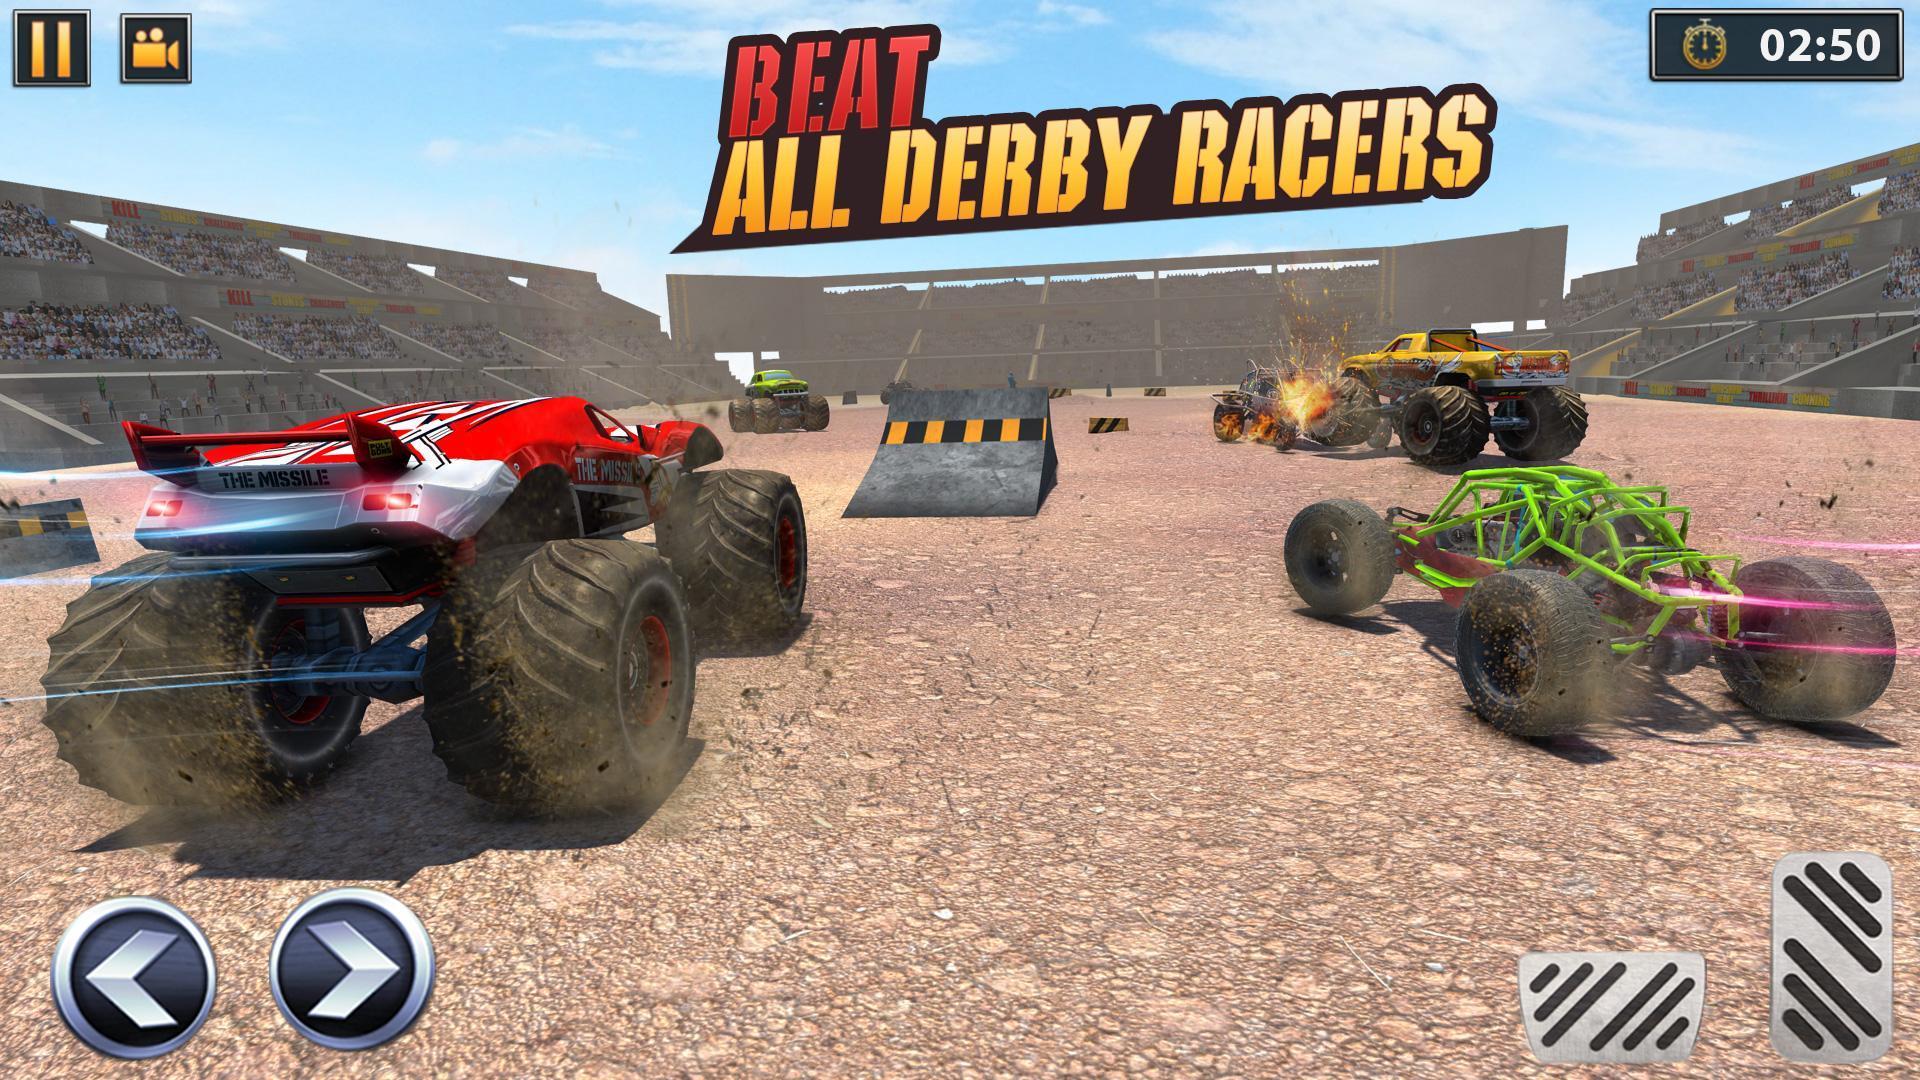 Real Monster Truck Demolition Derby Crash Stunts 3.0.3 Screenshot 7